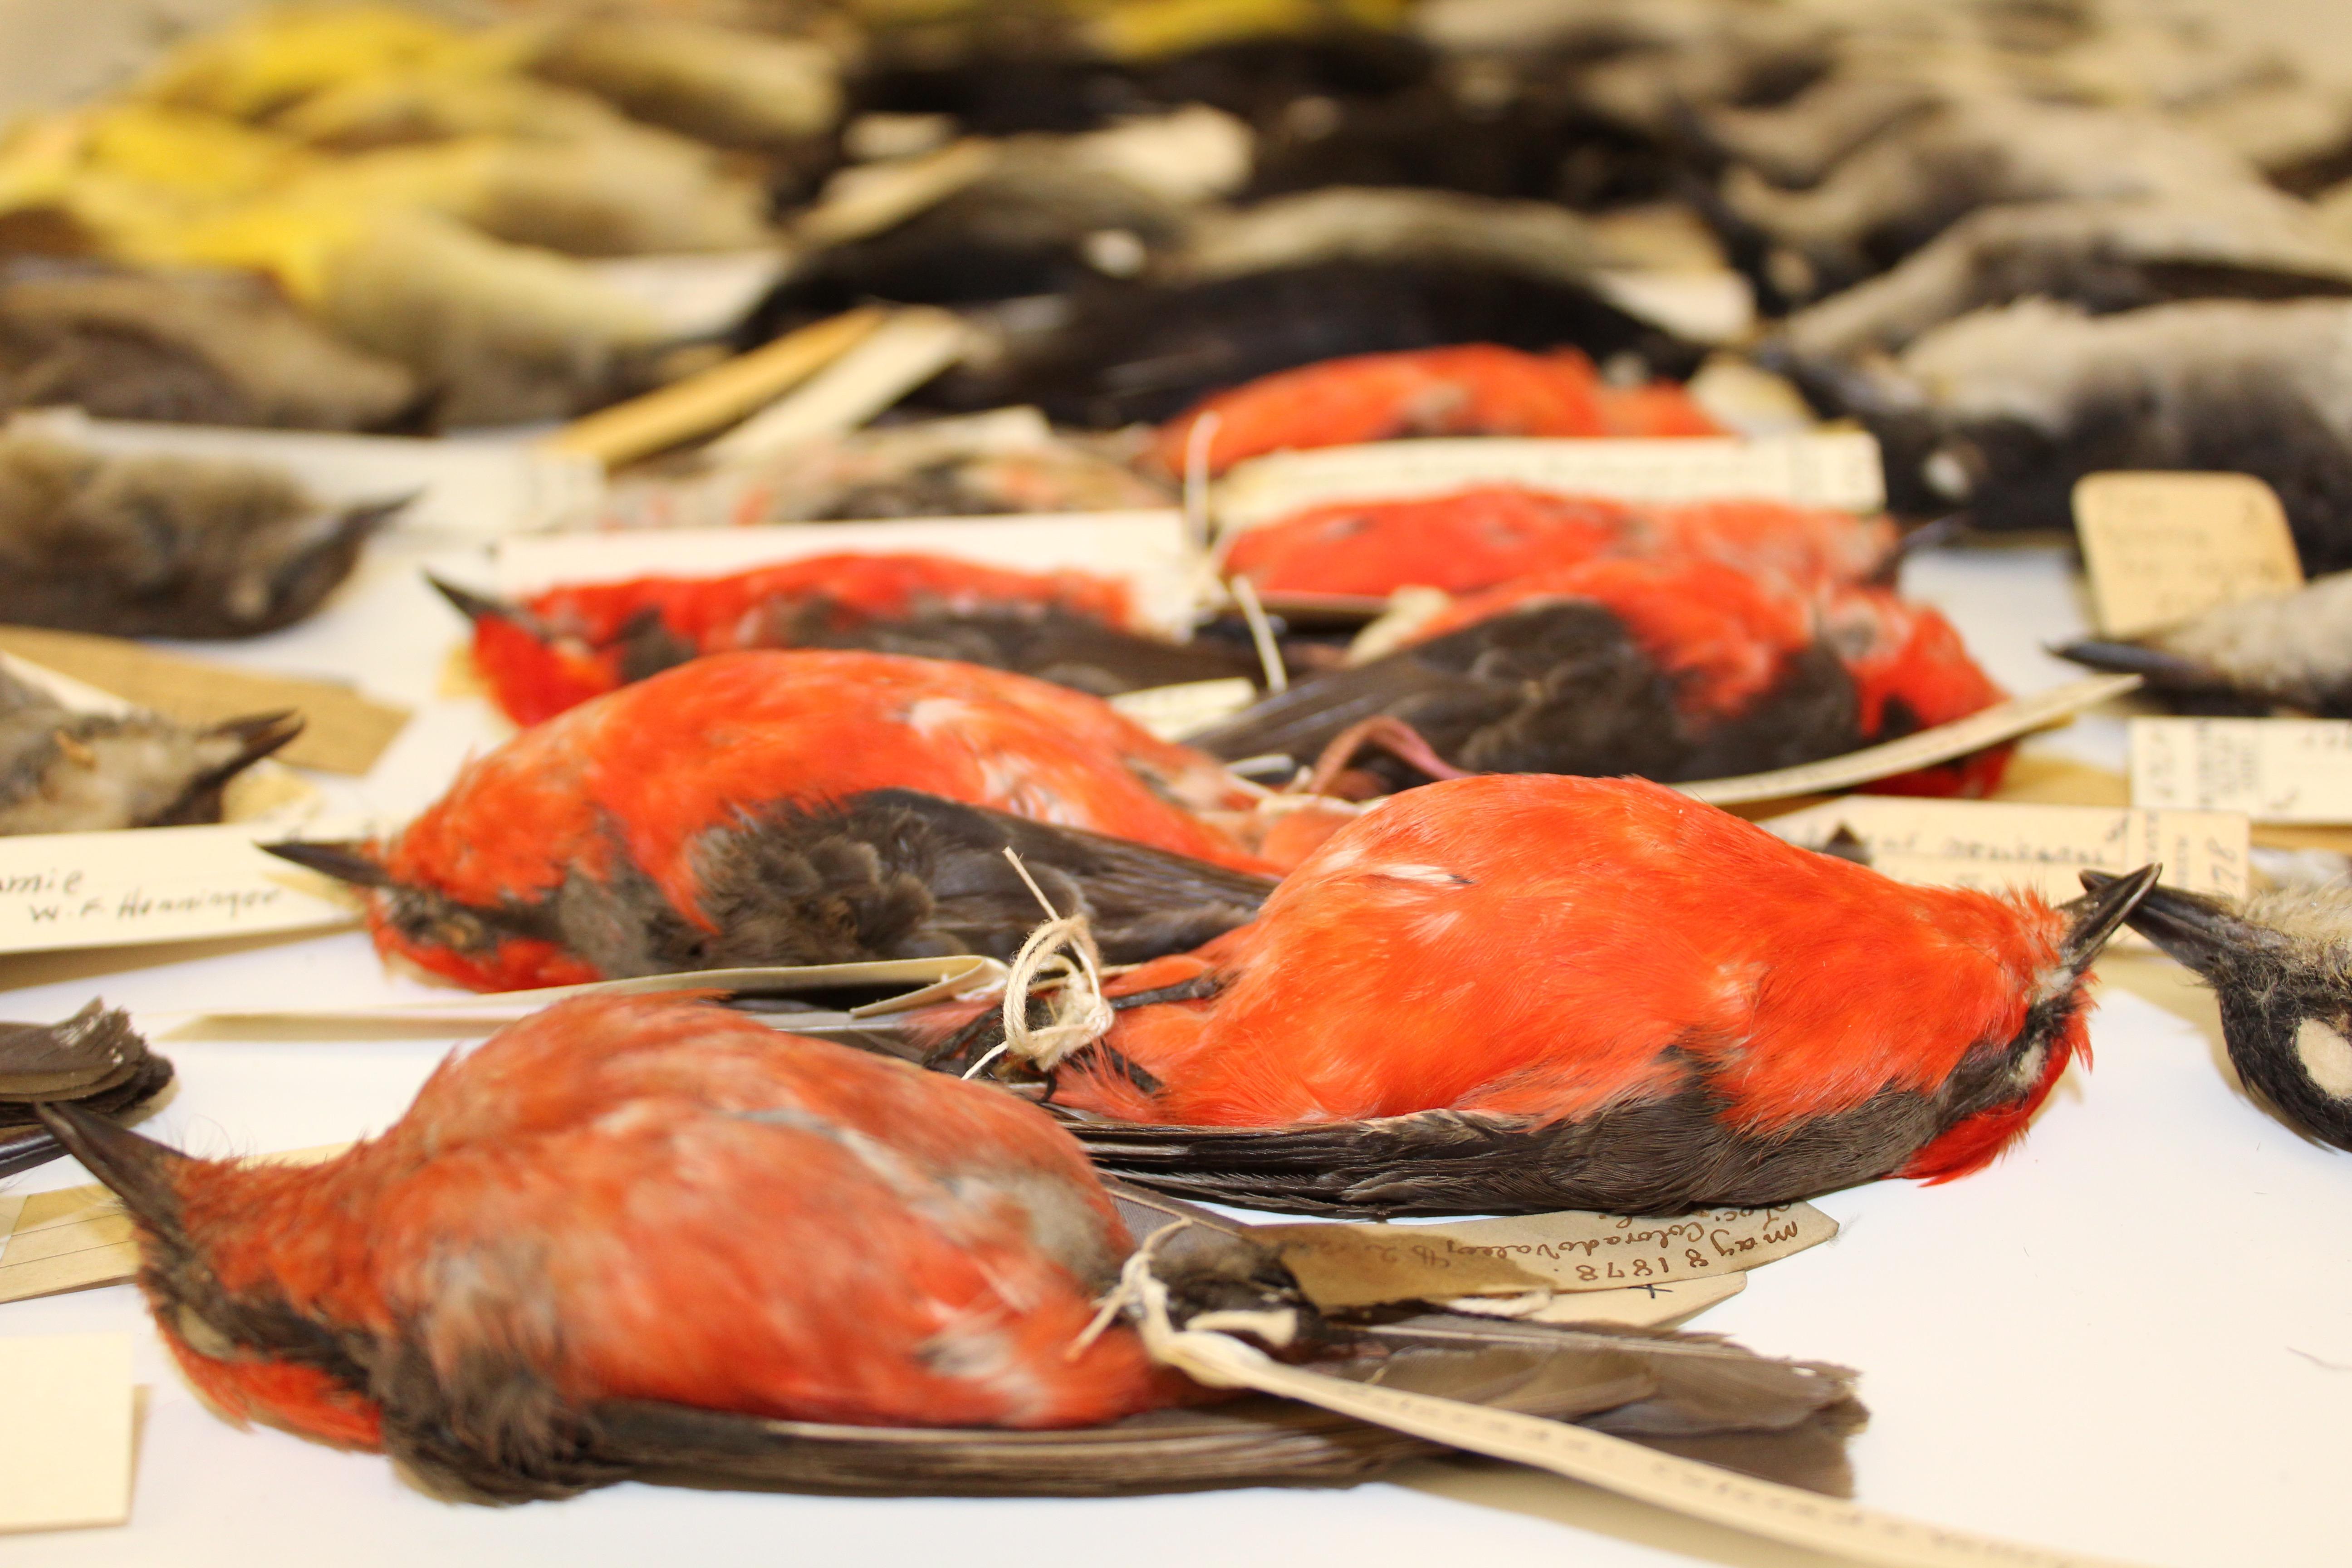 Vermilion Flycatcher specimen